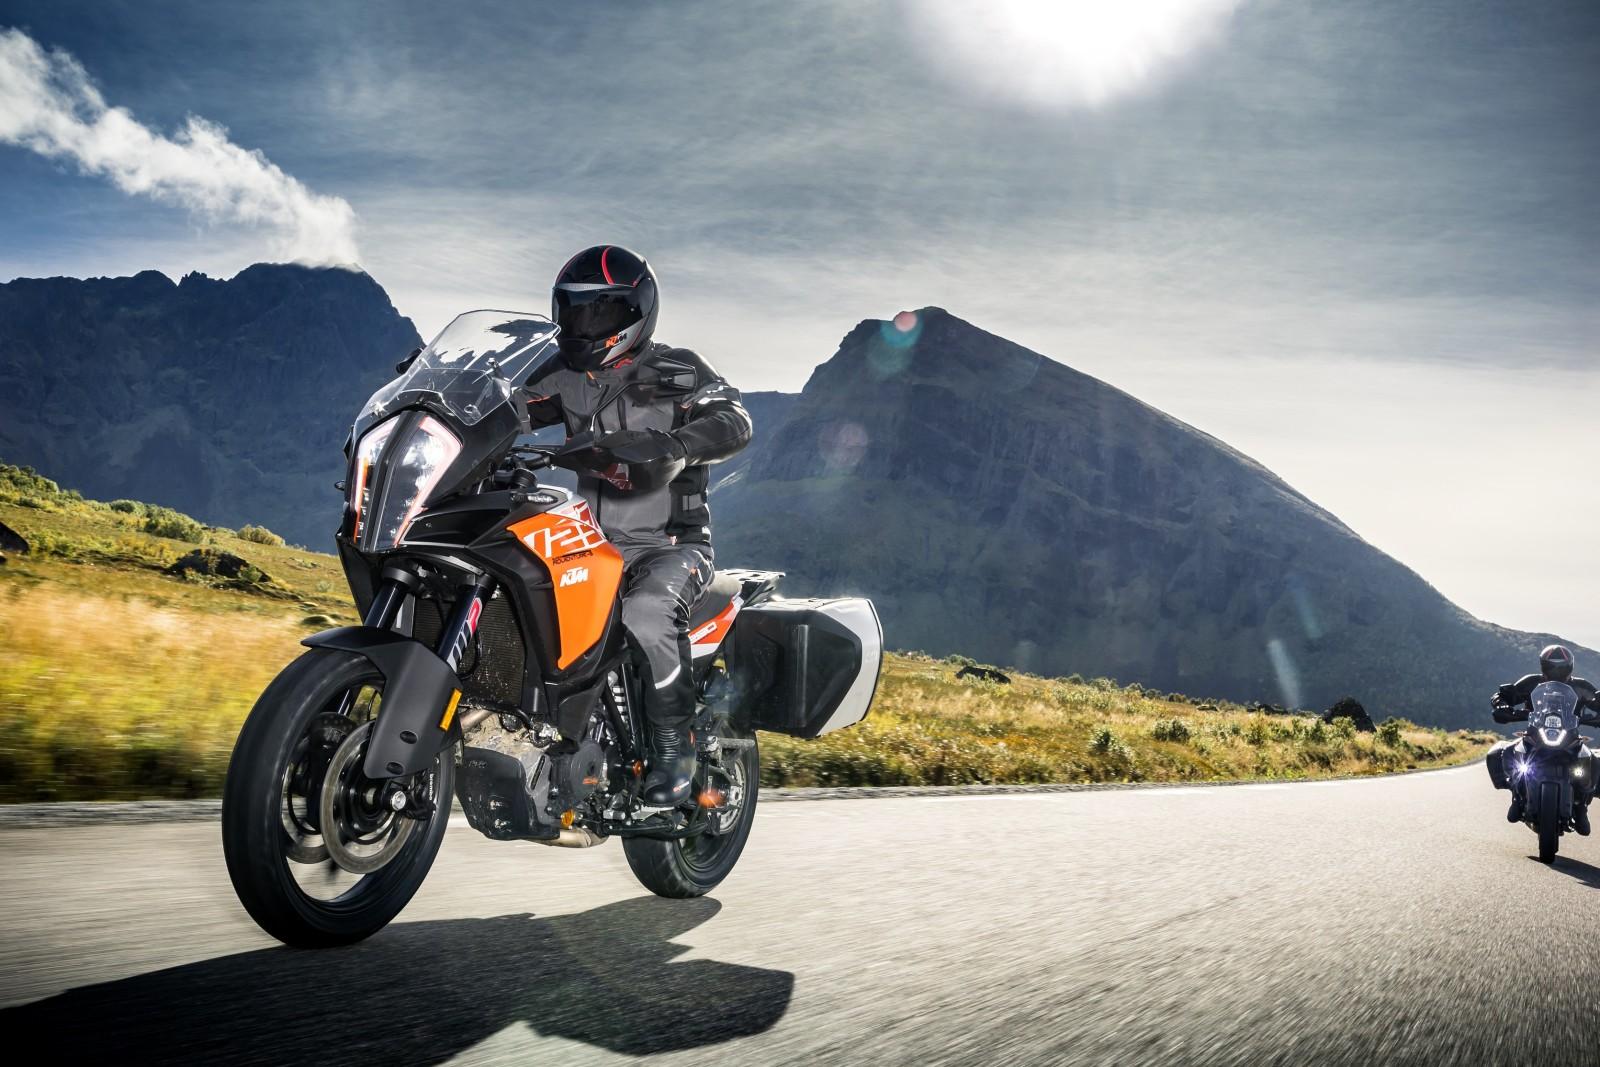 intermot 2016 new 2017 ktm adventure 1290 adventure 1090